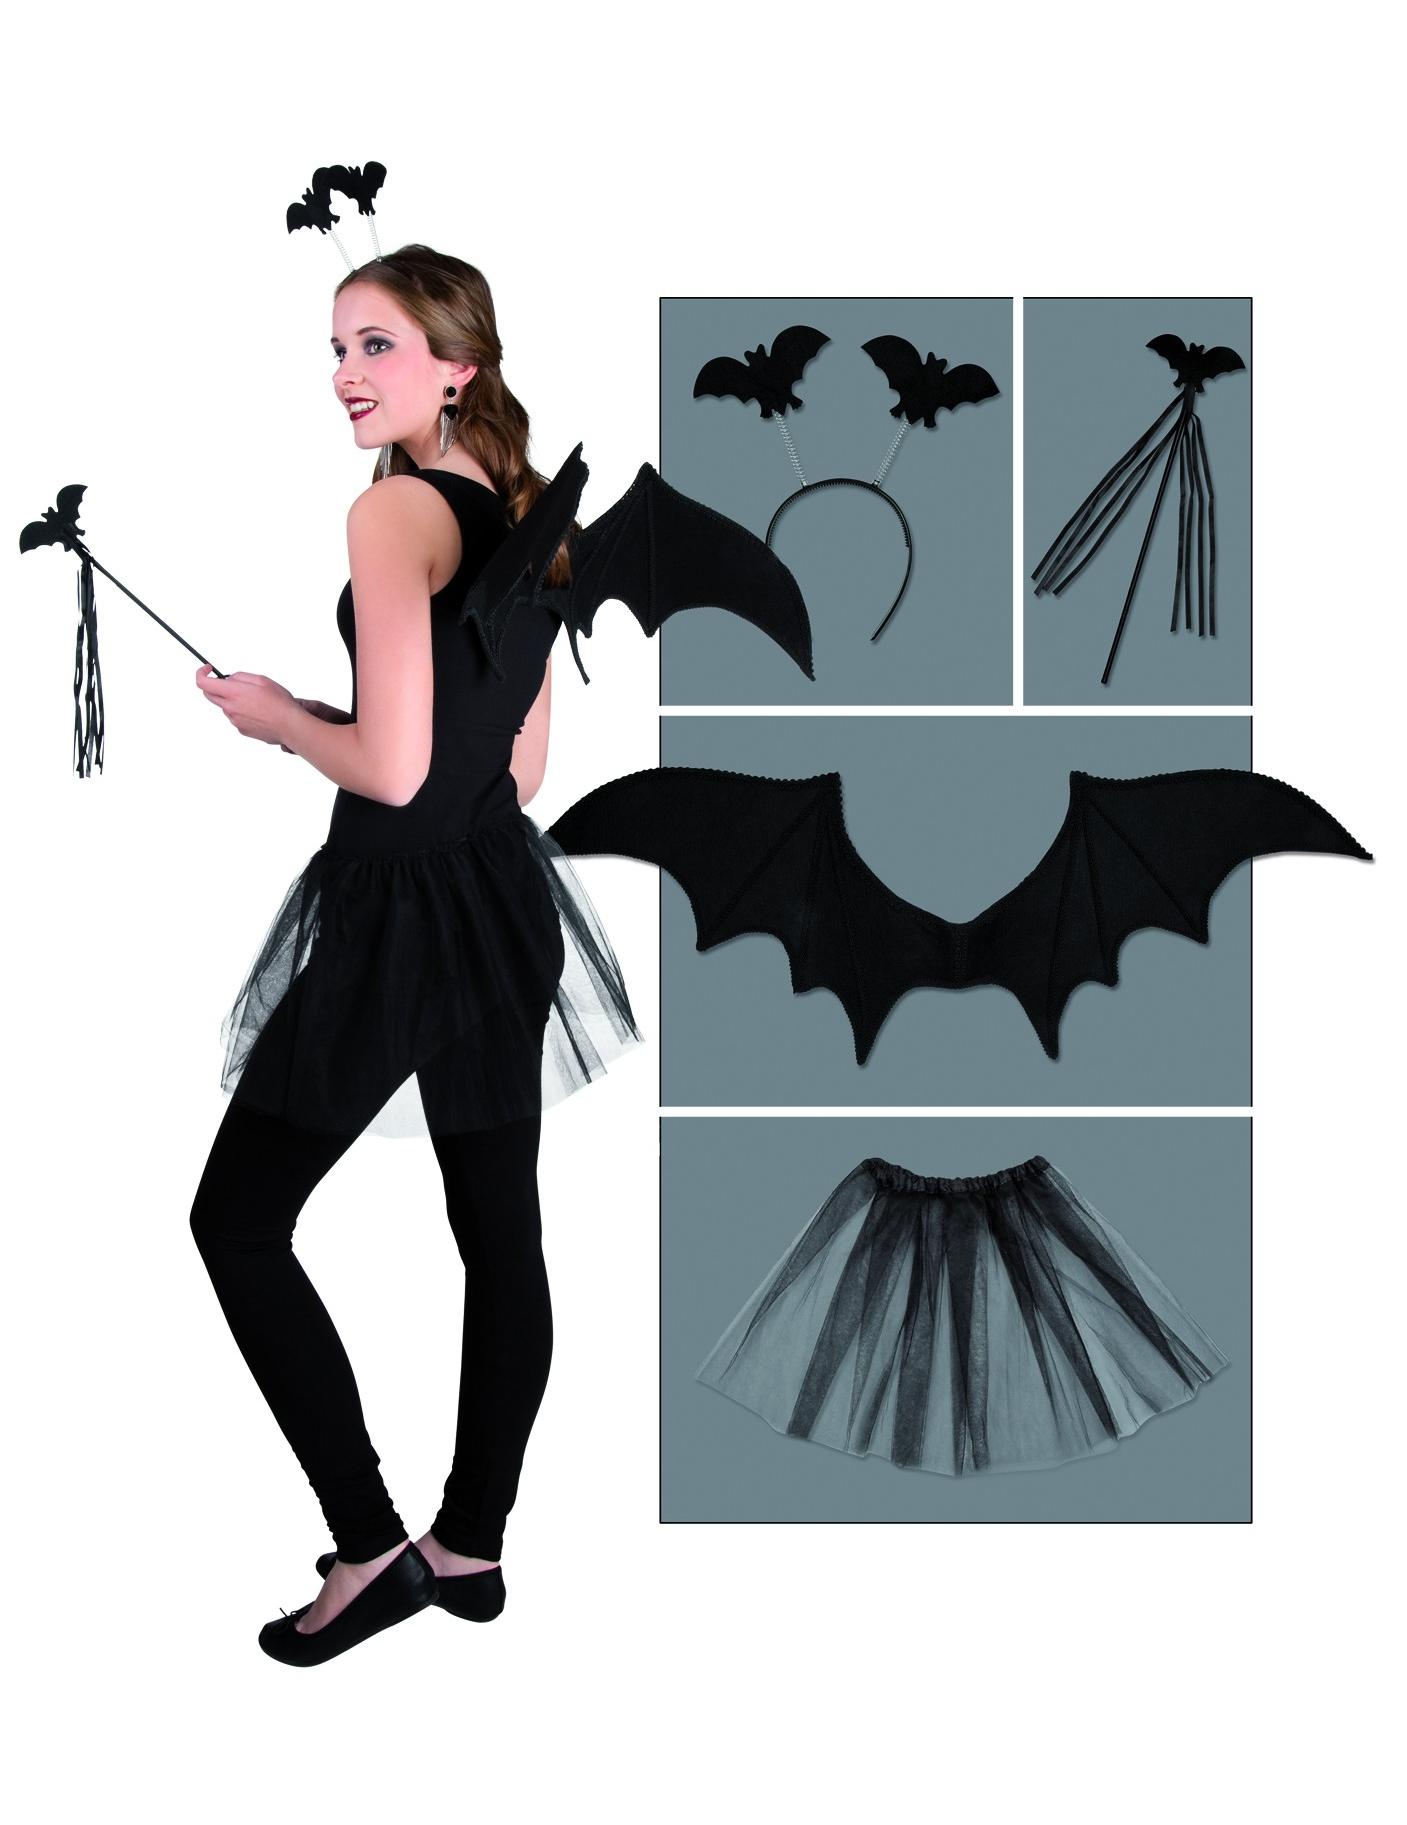 Süsses Fledermaus Kostüm Set Halloween 4 Teilig Schwarz Günstige